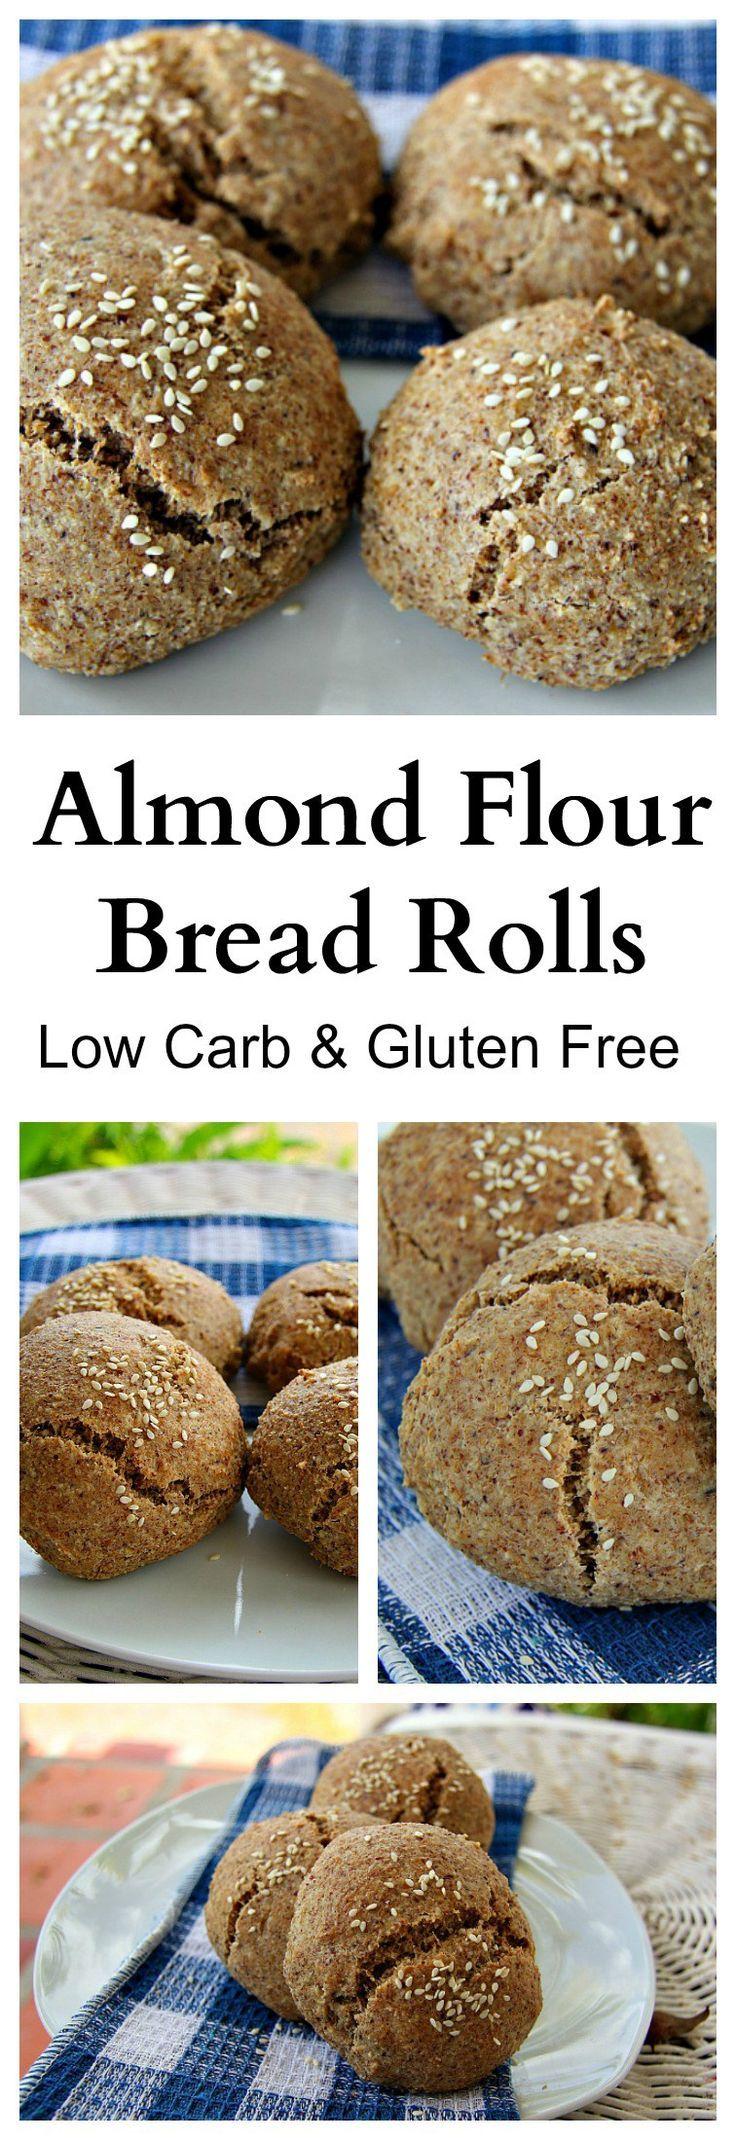 Amazing Bread Rolls Low Carb Gluten Free Divalicious Recipes Recipe Low Carb Gluten Free Low Carb Bread Low Carb Recipes